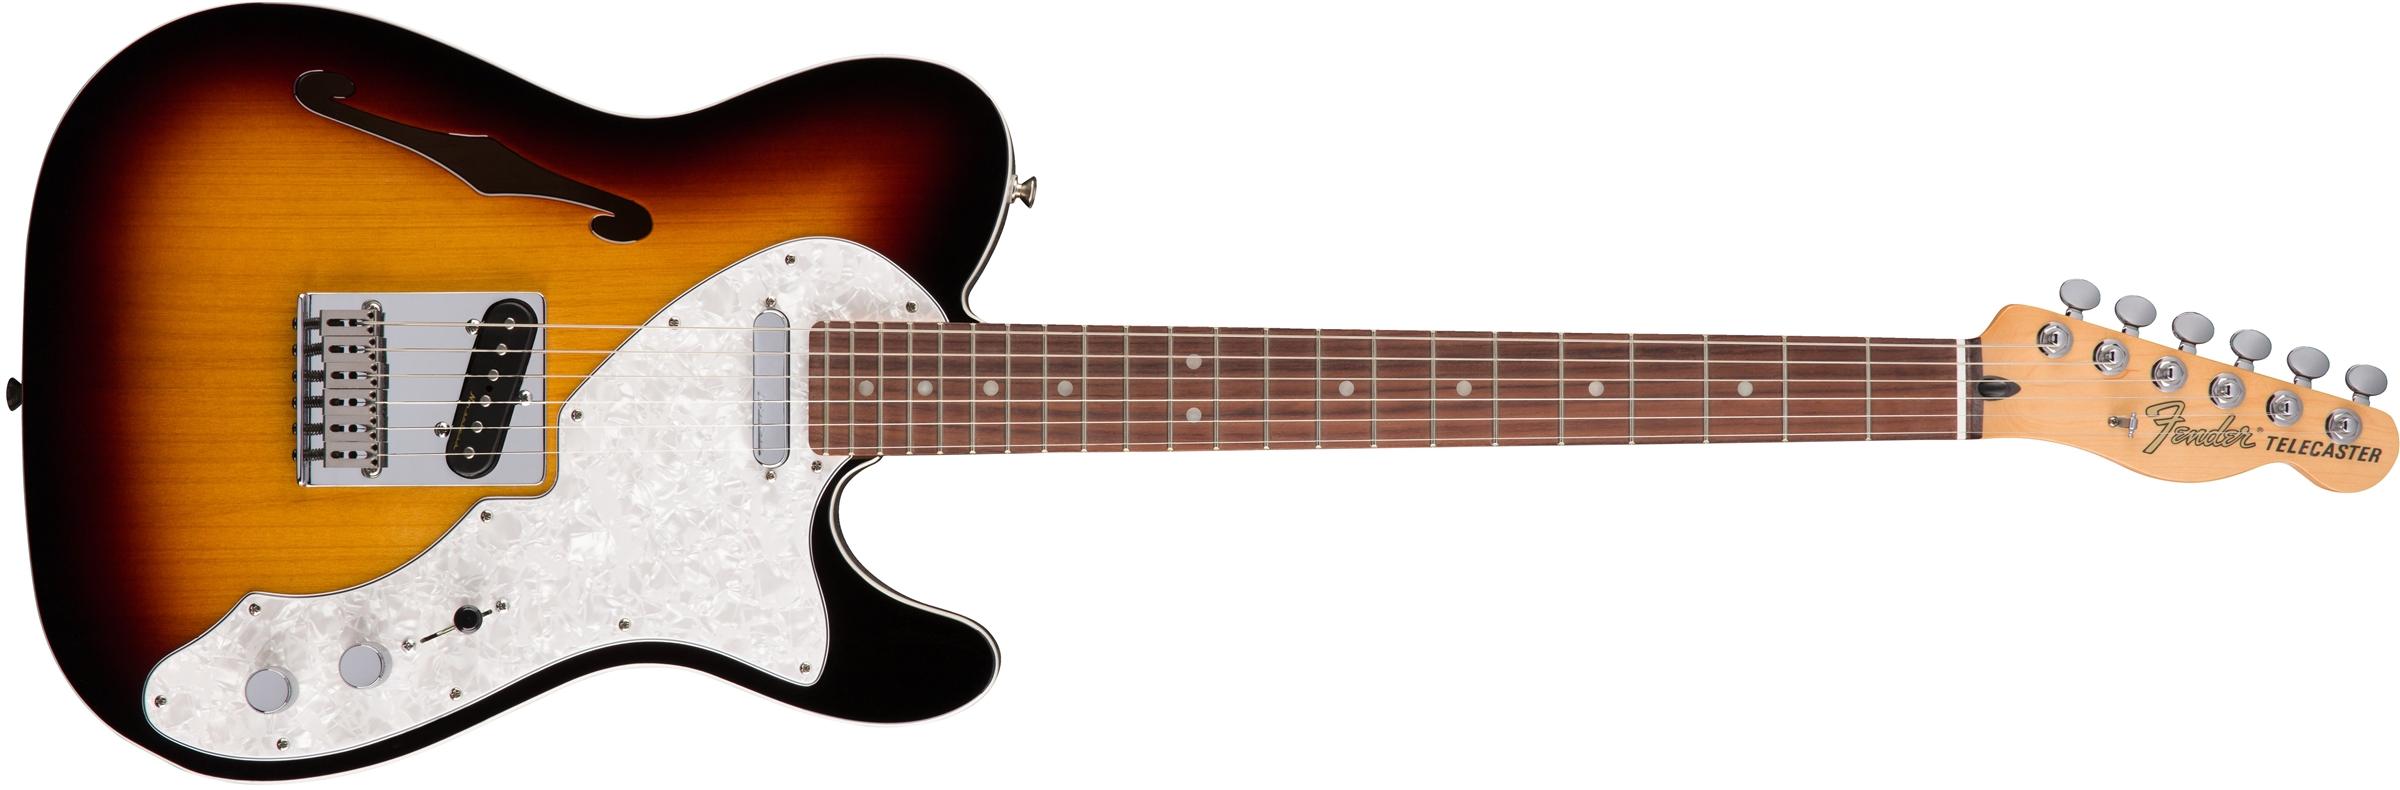 Fender Deluxe Telecaster 174 Thinline Rosewood Fingerboard